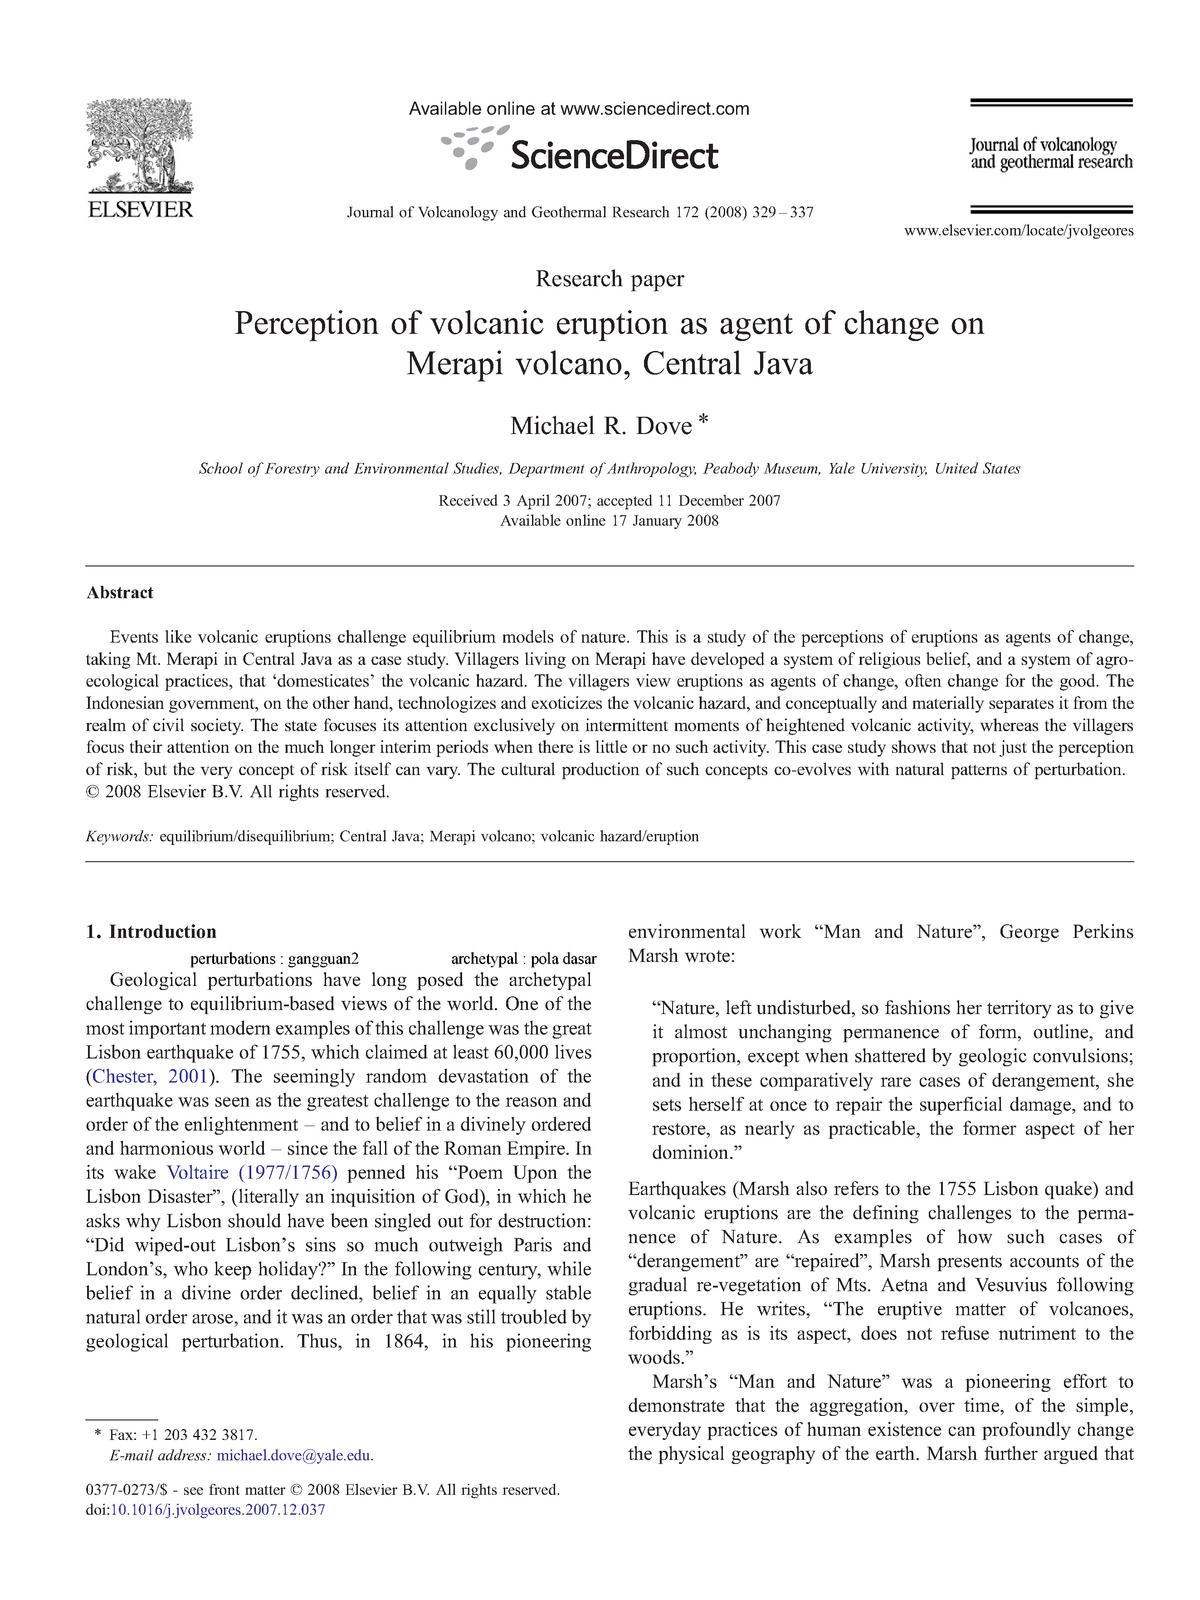 Dove Eruption Merapi - ECON 308 History of Economic Thought